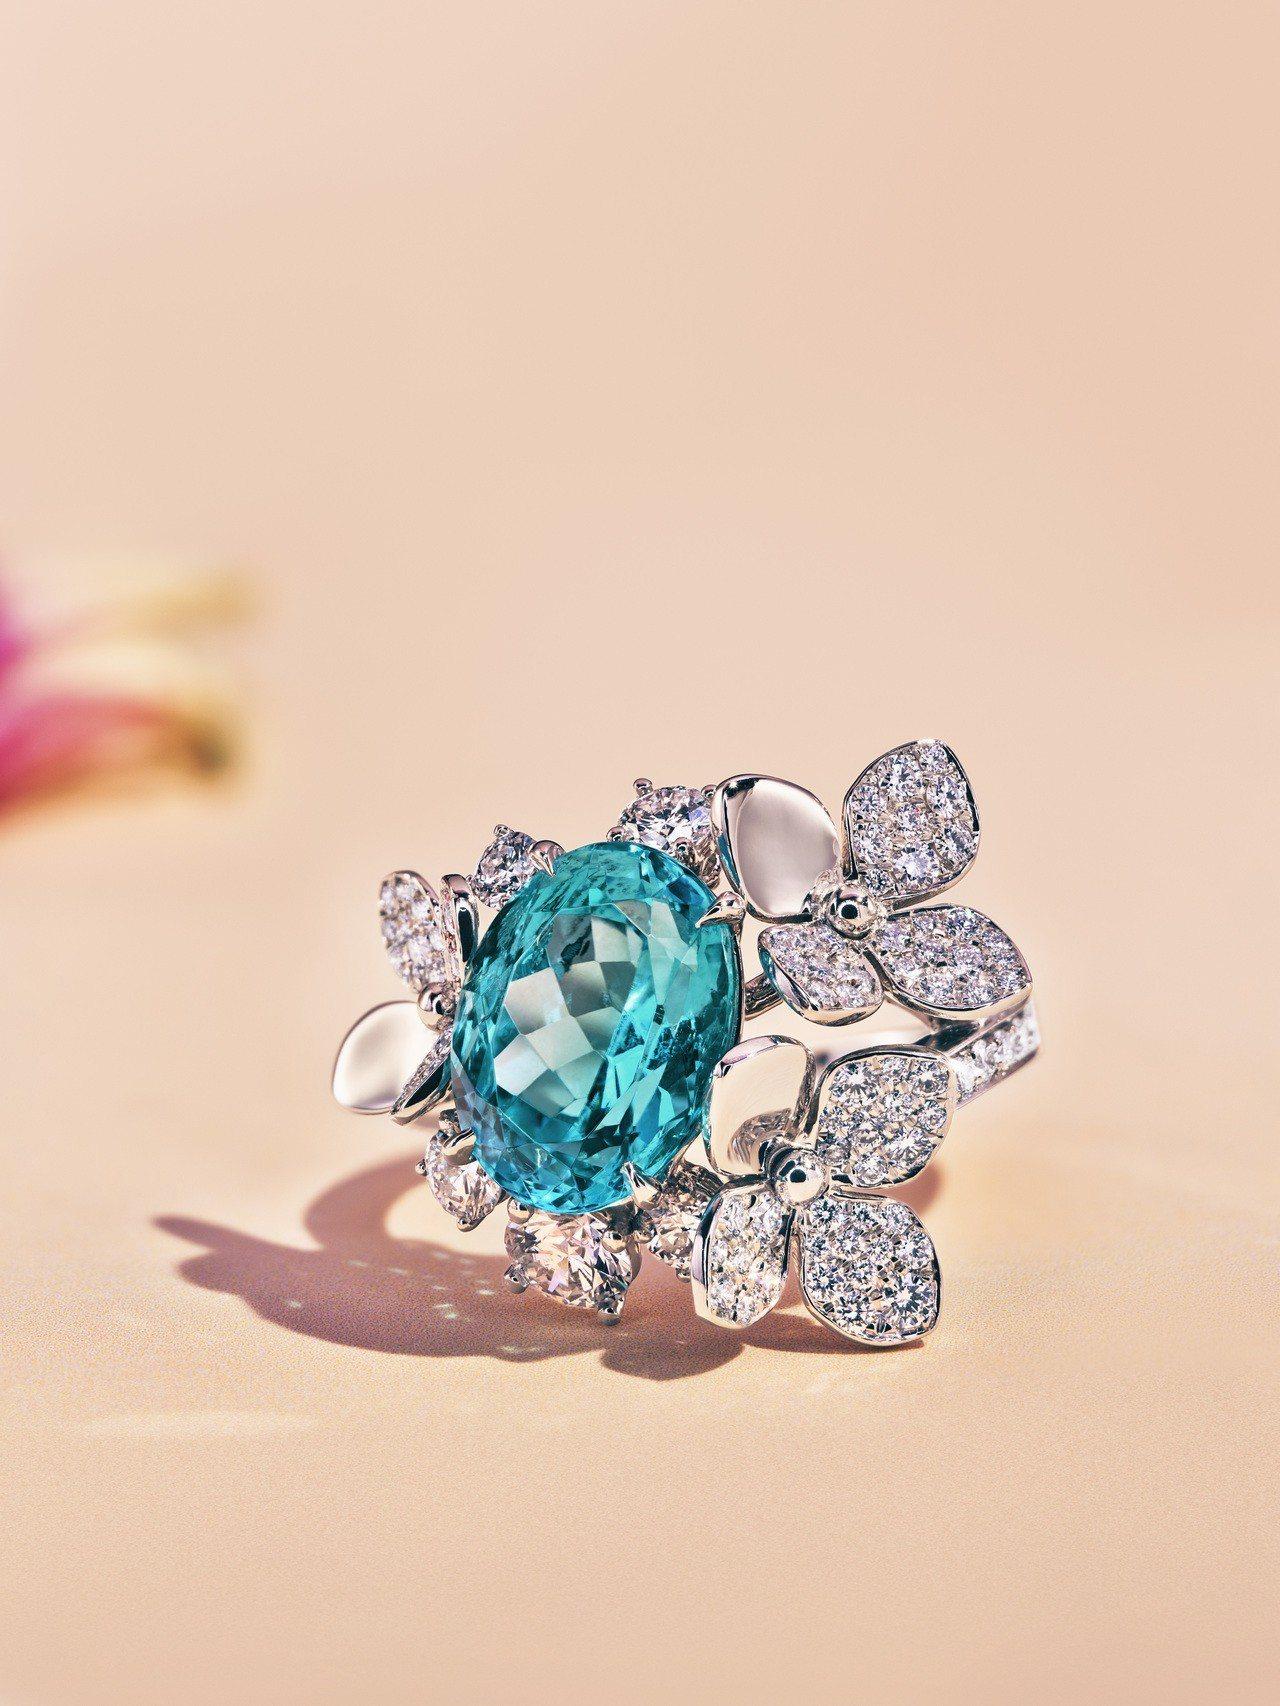 Tiffany 2018 Blue Book系列春季主題,鉑金鑲嵌逾3克拉橢圓形...